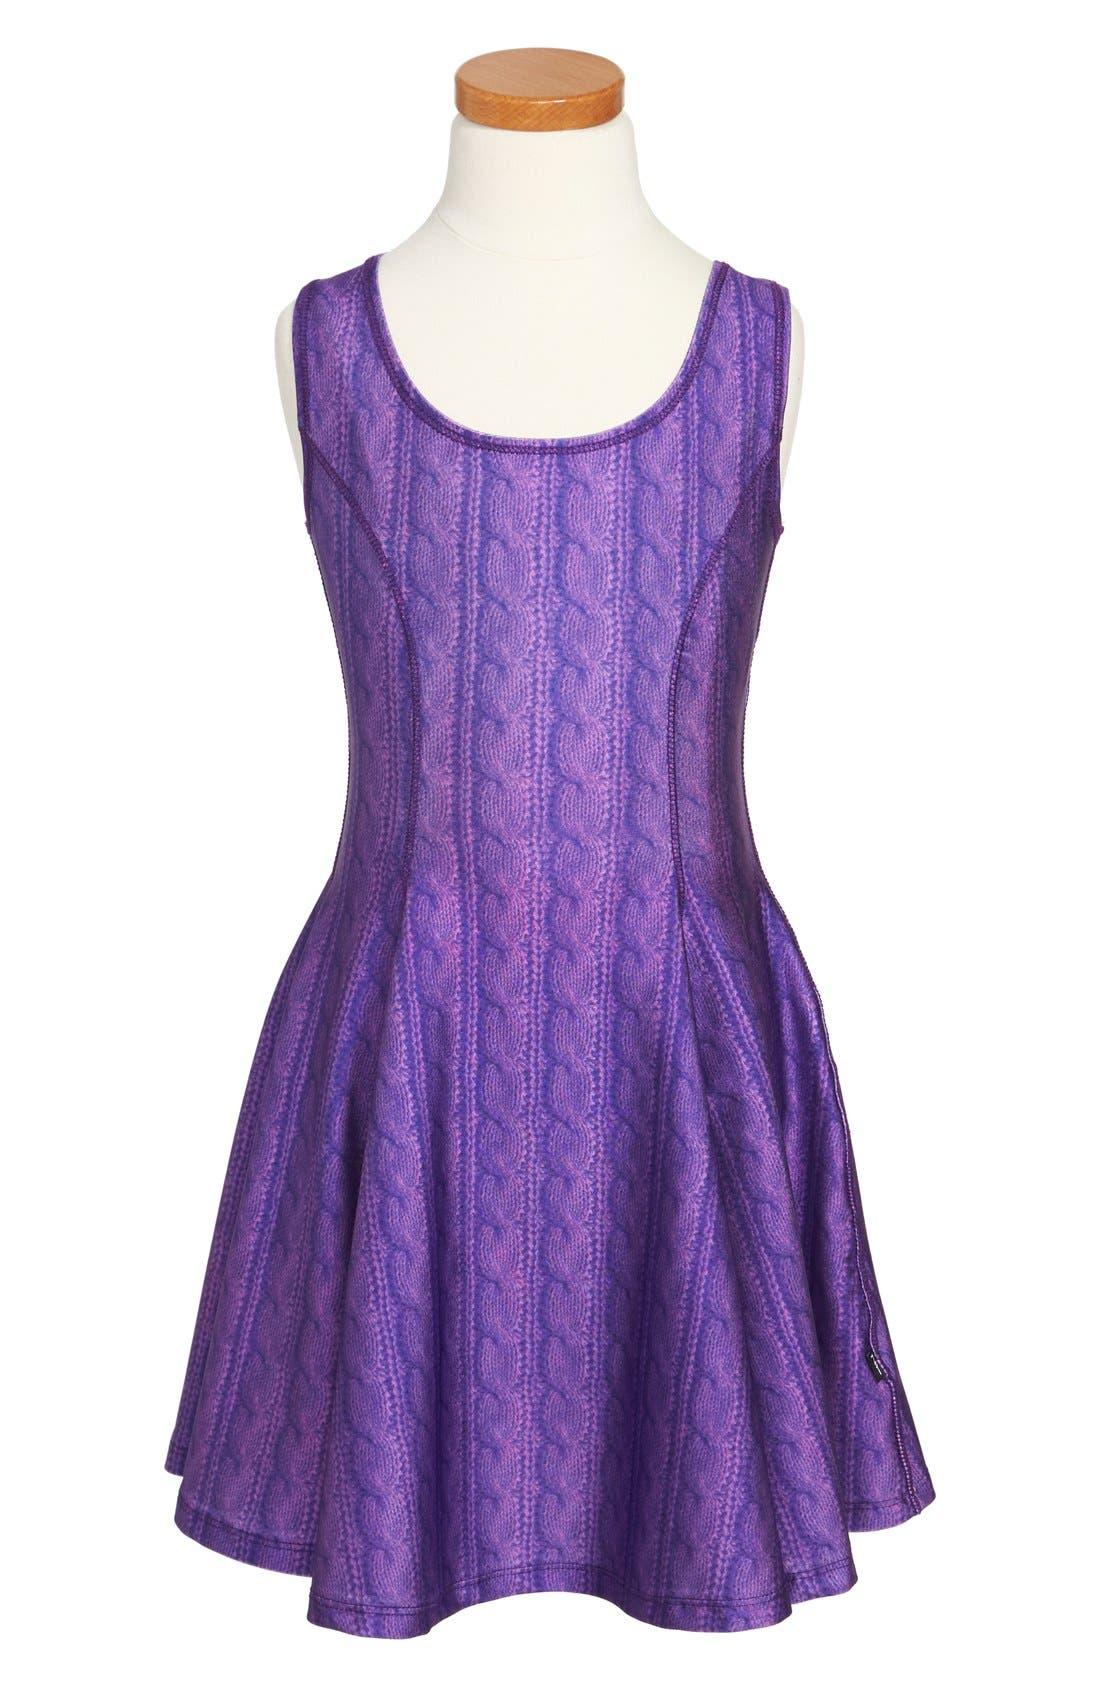 Alternate Image 1 Selected - Terez Cable Knit Dress (Big Girls)